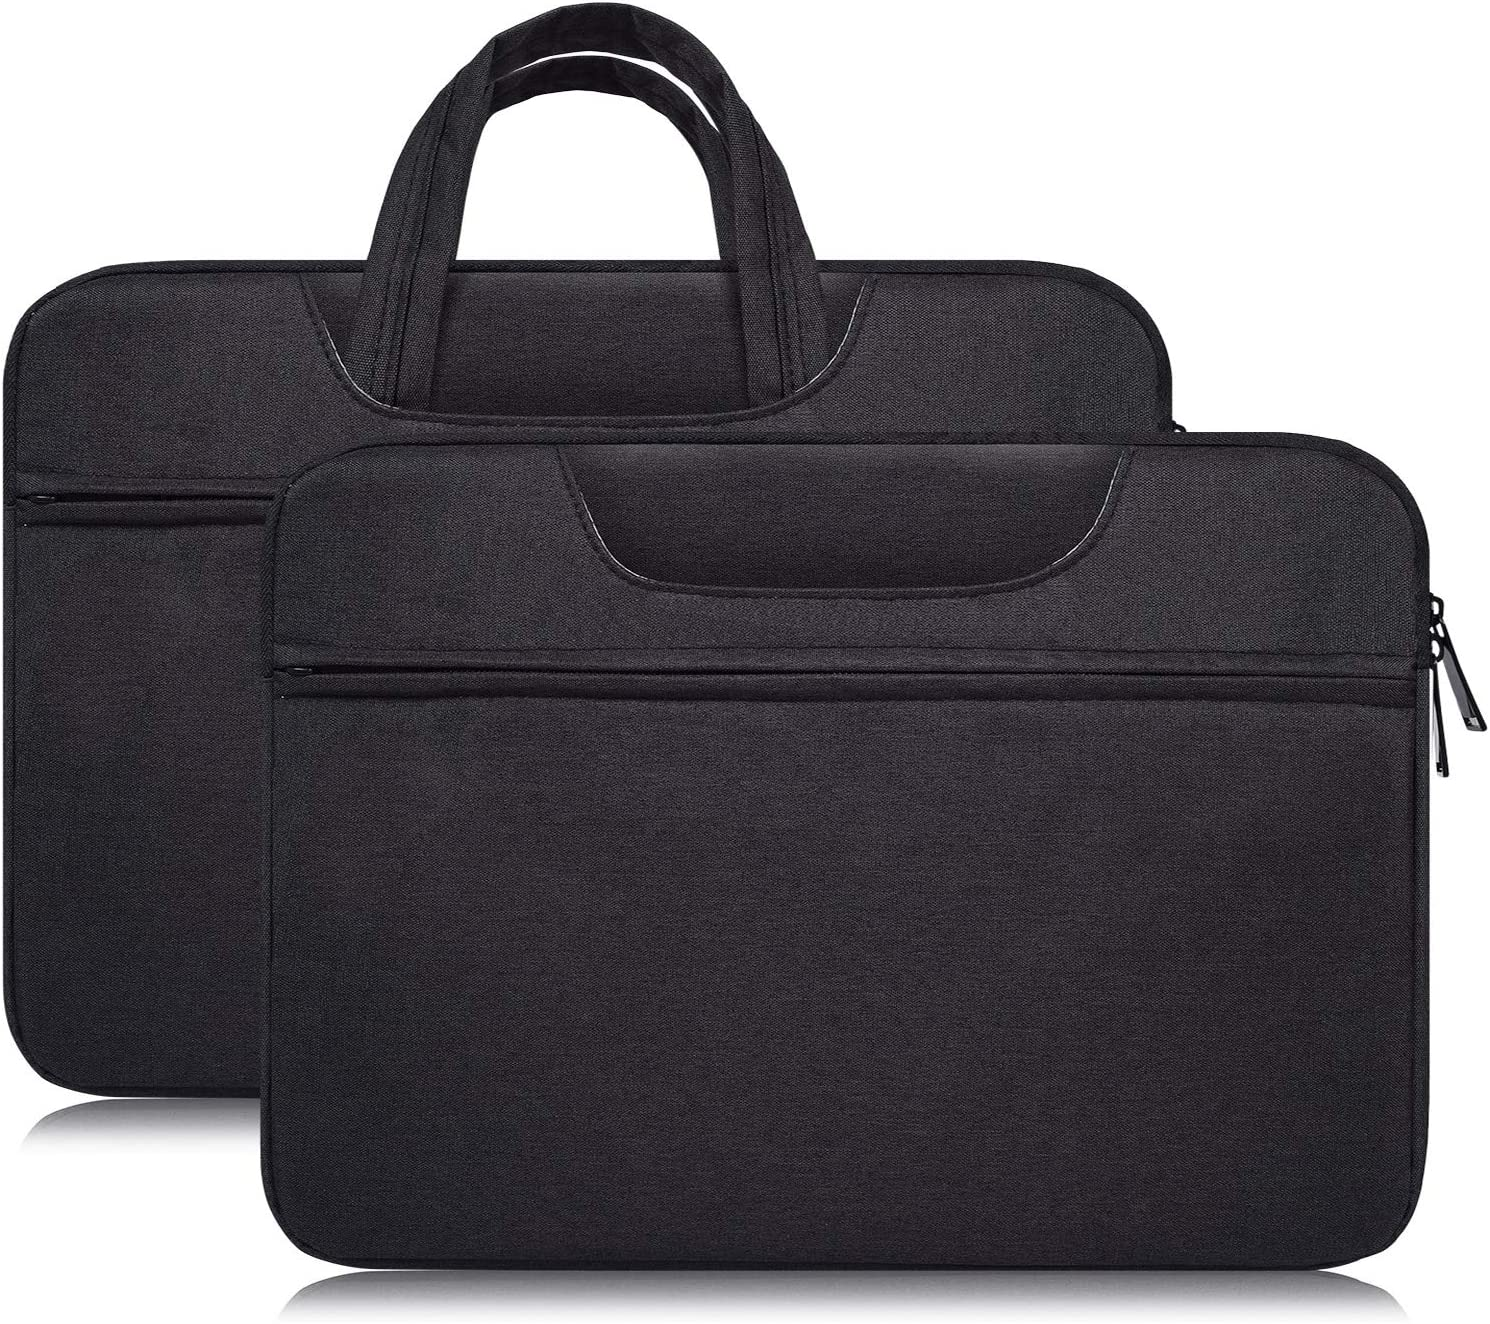 14-15 inch Laptop Sleeve Case for Lenovo Flex 14/Lenovo Chromebook S330 14/Lenovo IdeaPad 3 14